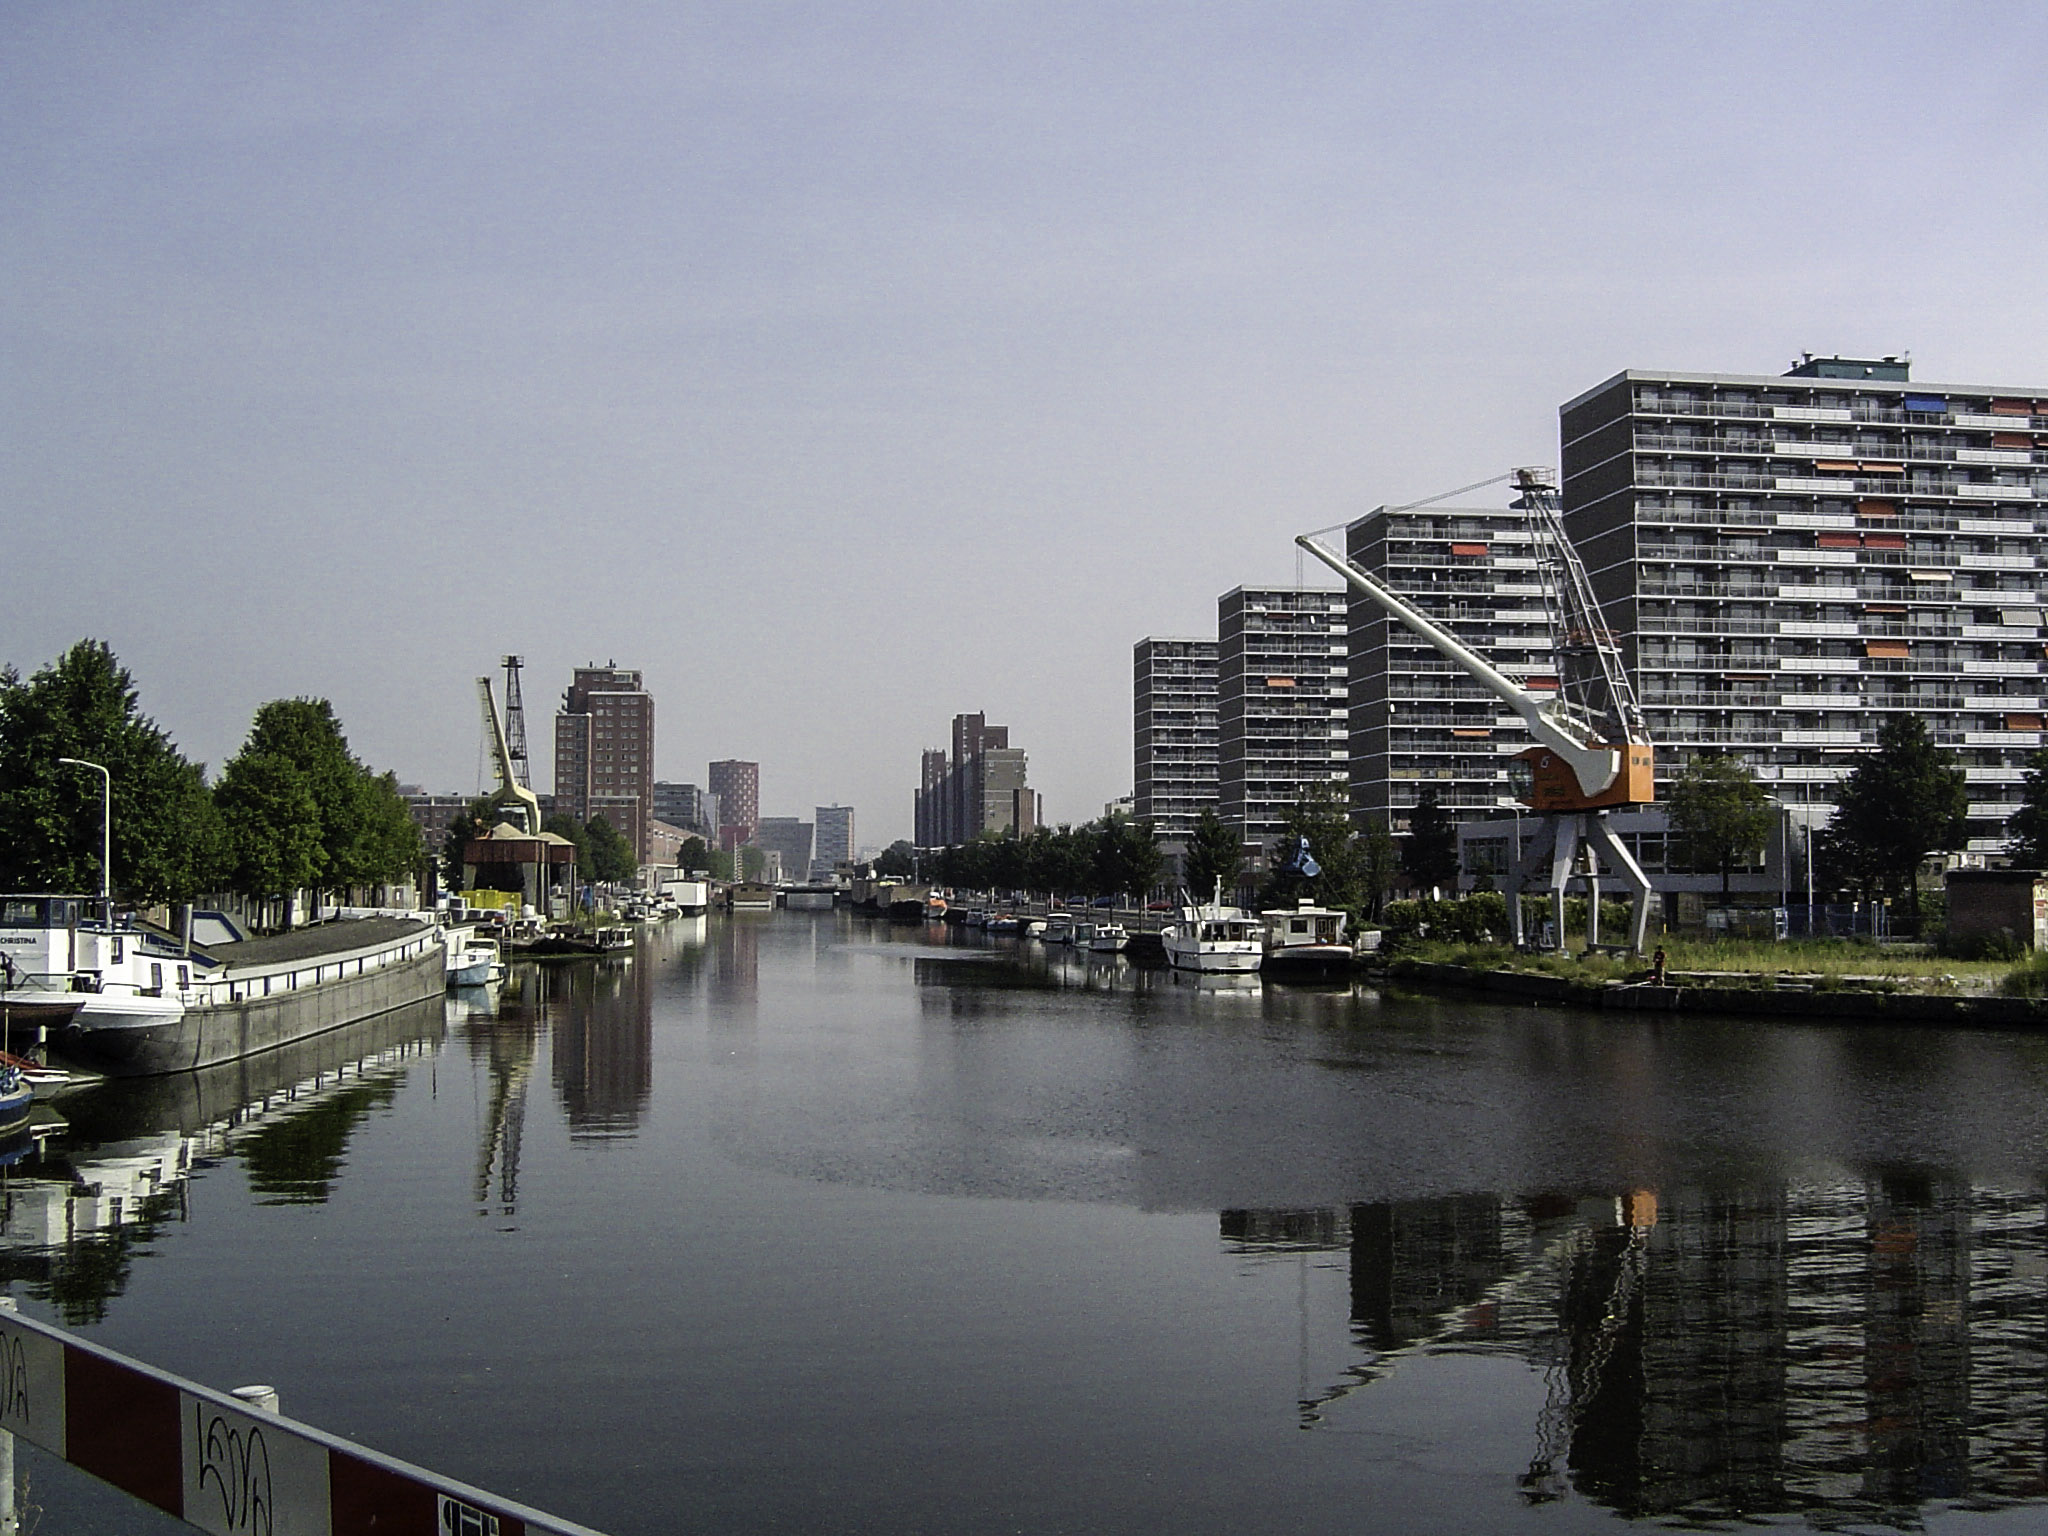 Neherkade in the Hague Netherlands image - Free stock photo ...